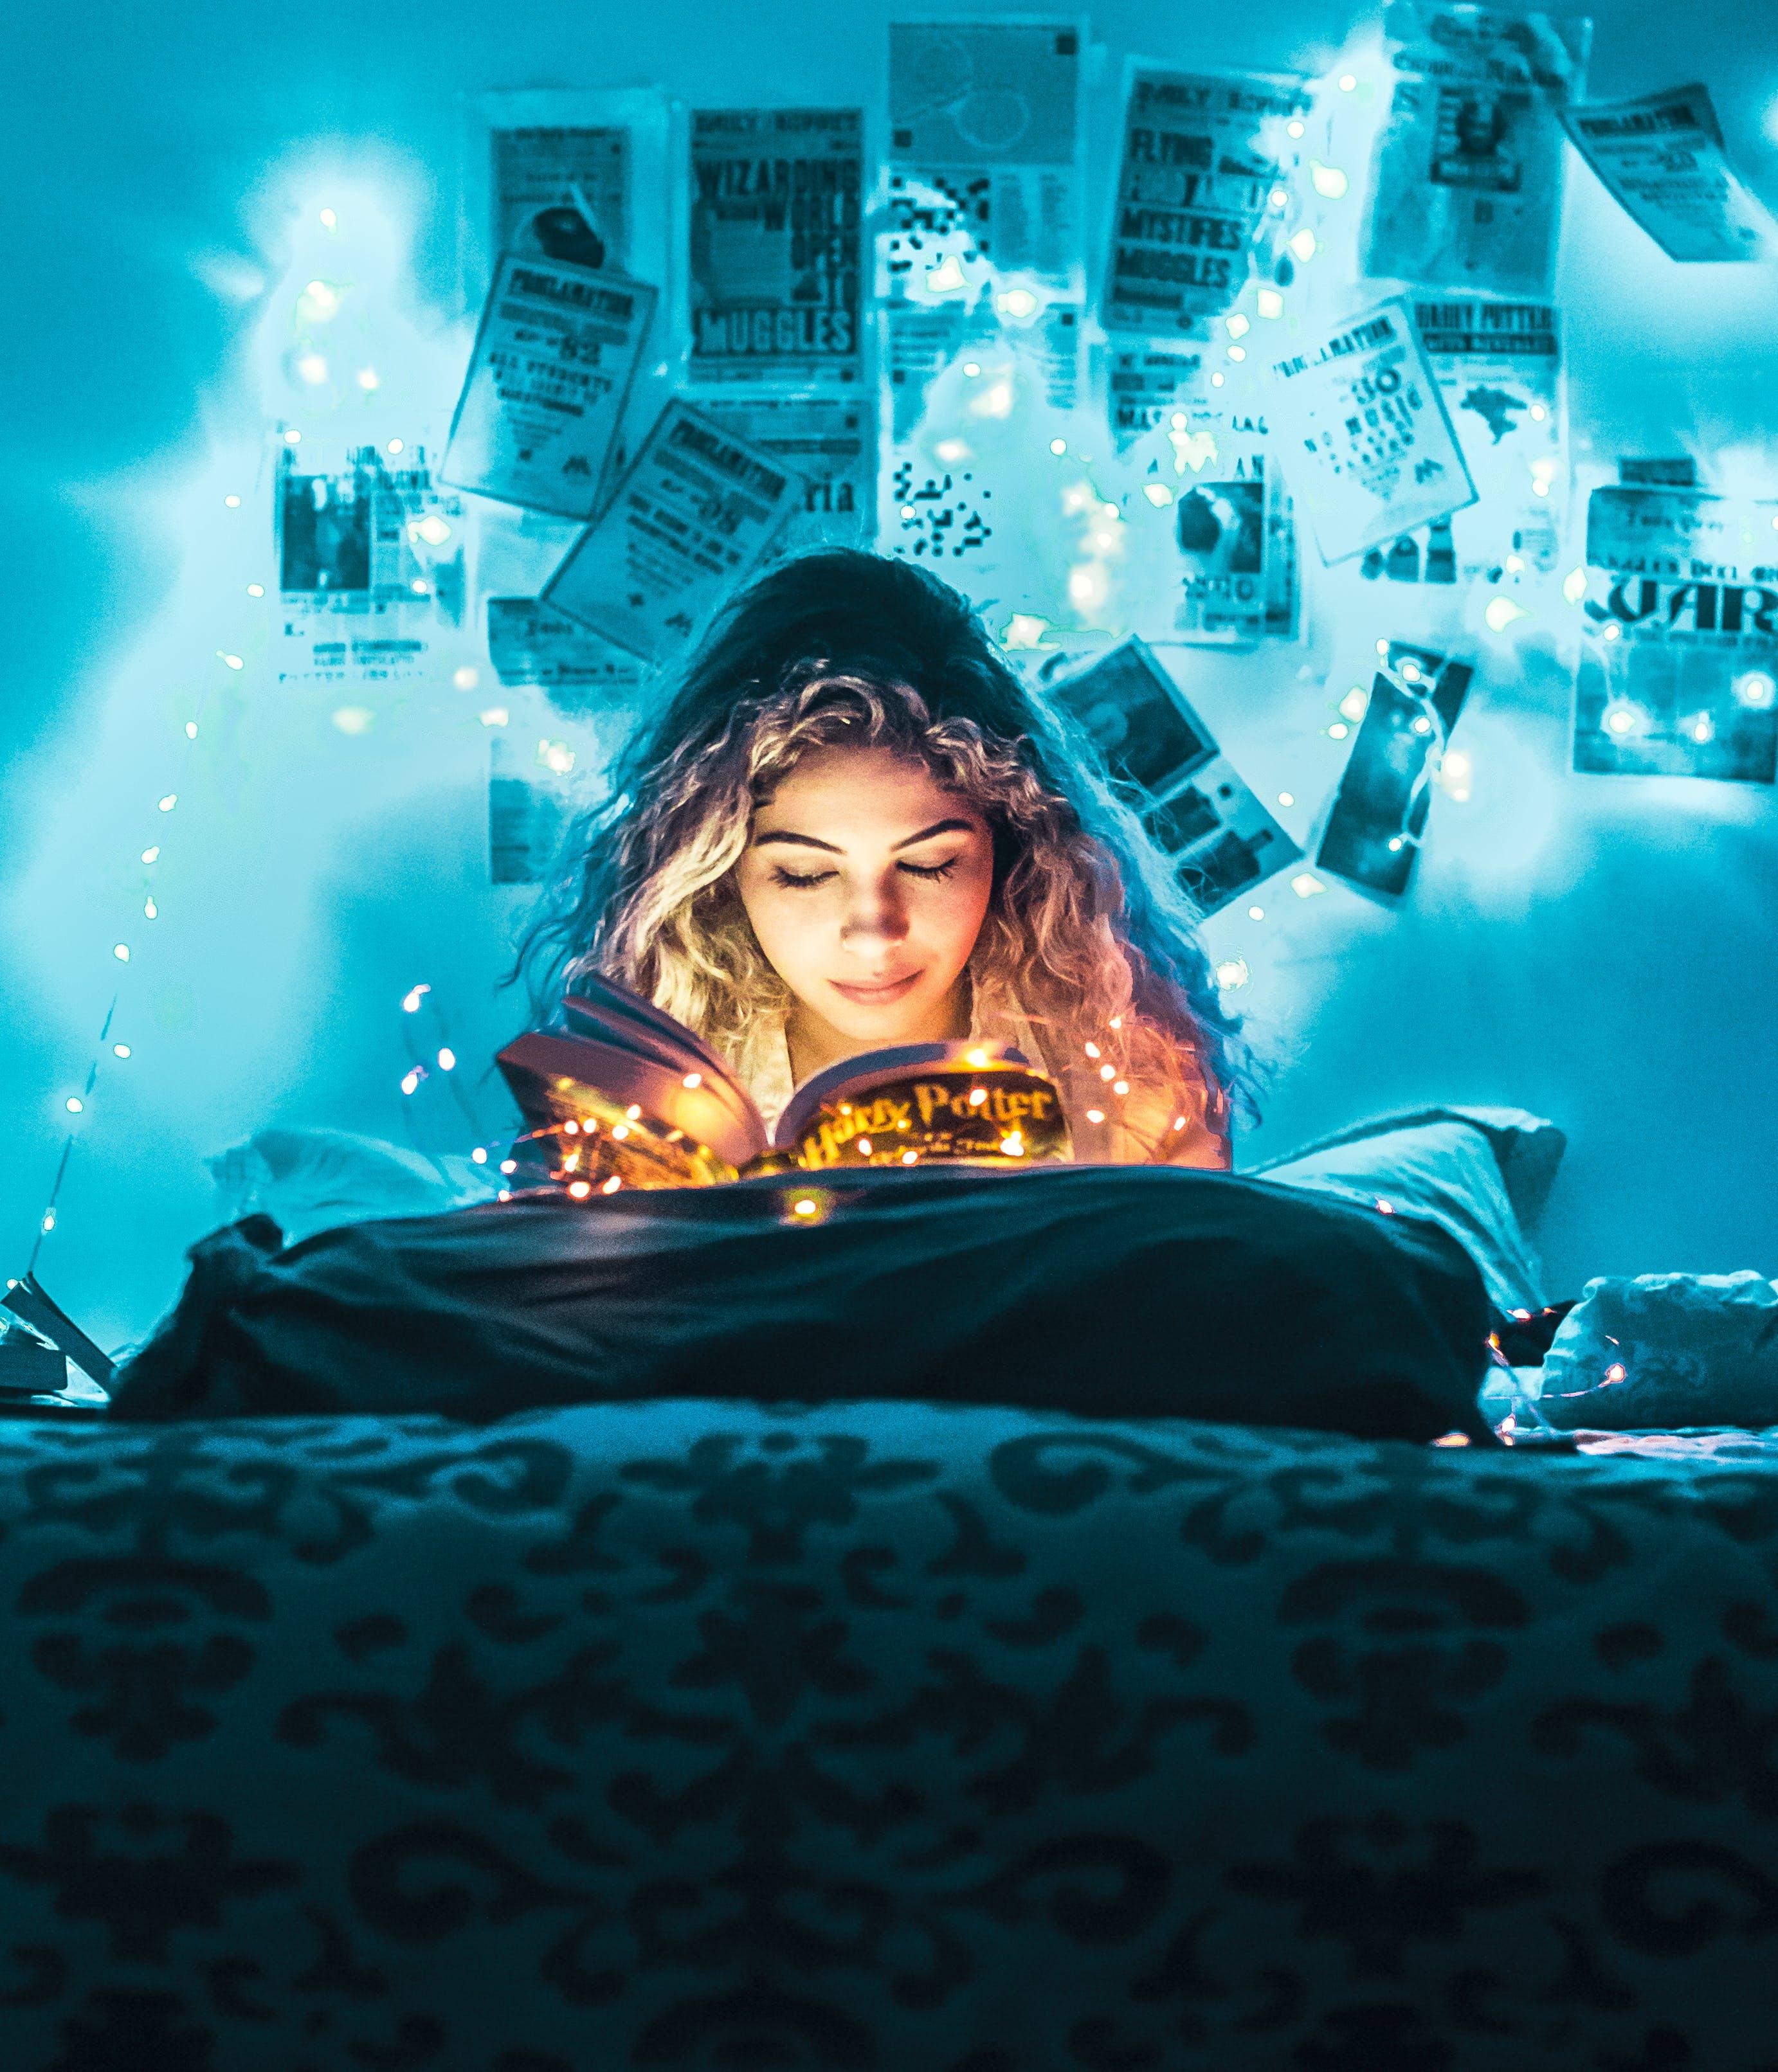 Kostenloses Stock Foto zu beleuchtung, frau, lesen, lichterketten